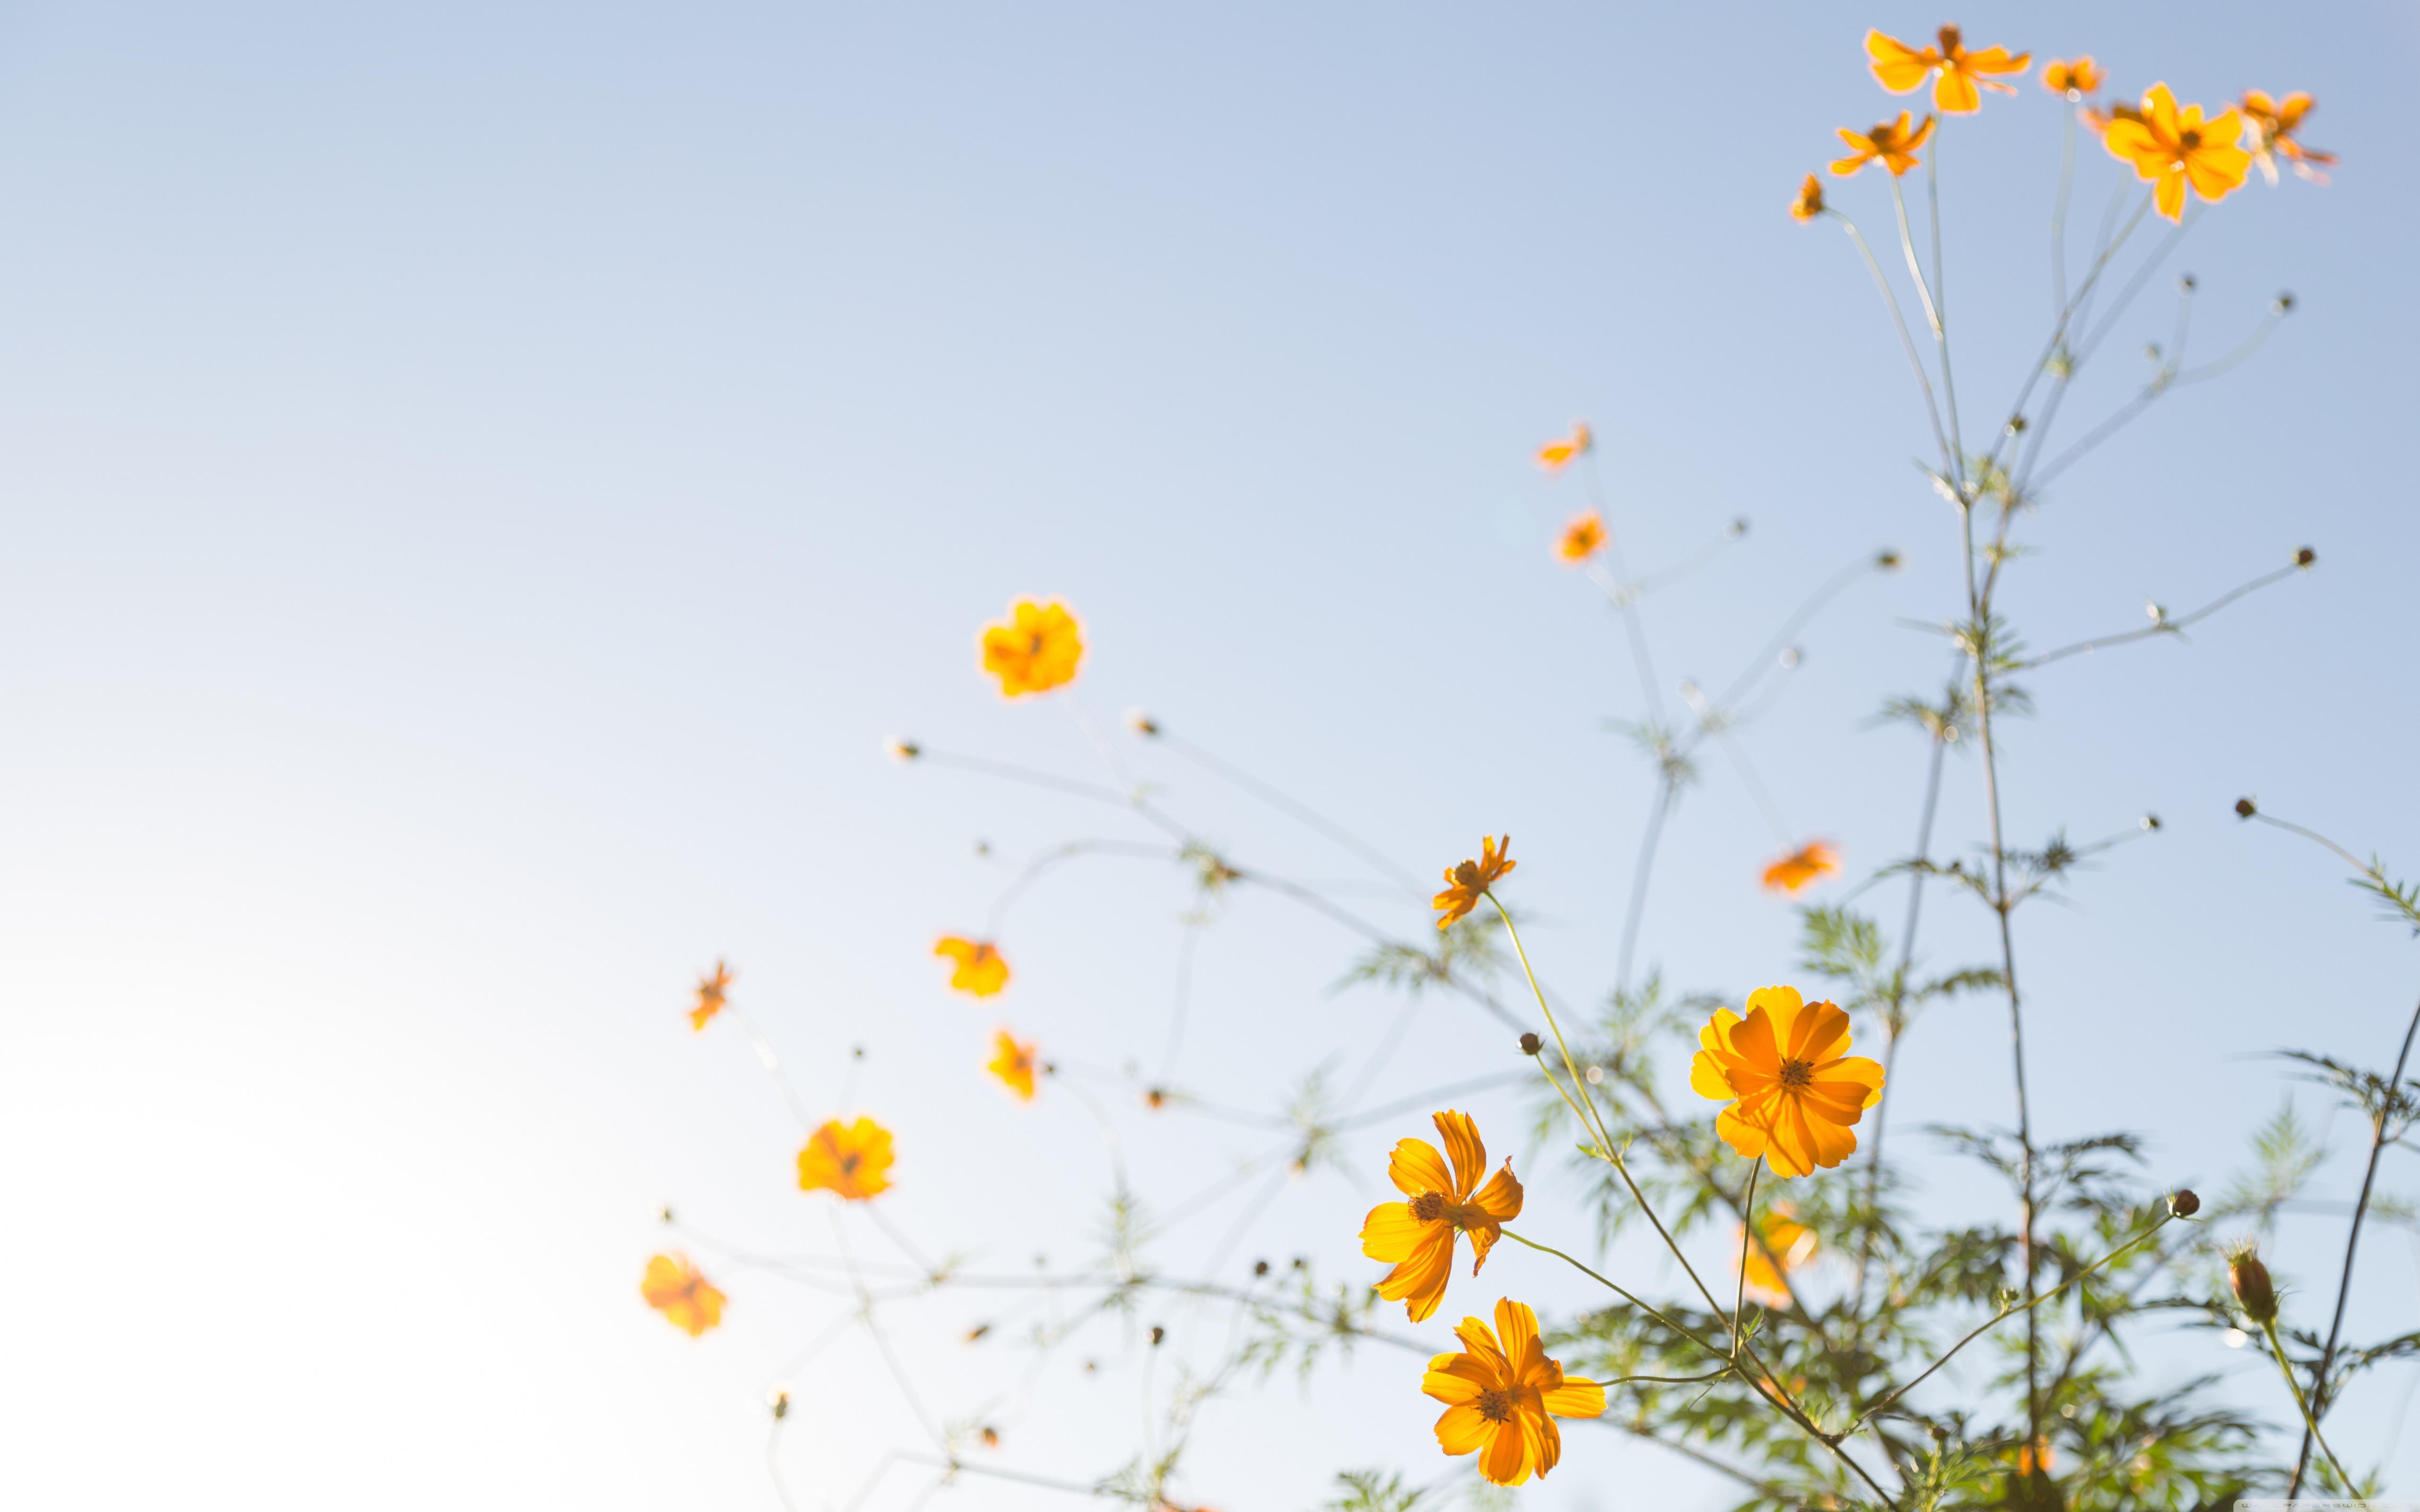 Free Download Yellow Flowers In Sunlight 4k Hd Desktop Wallpaper For 4k Ultra 5120x3200 For Your Desktop Mobile Tablet Explore 58 Flower Desktop Wallpapers Free Flower Wallpaper And Screensavers